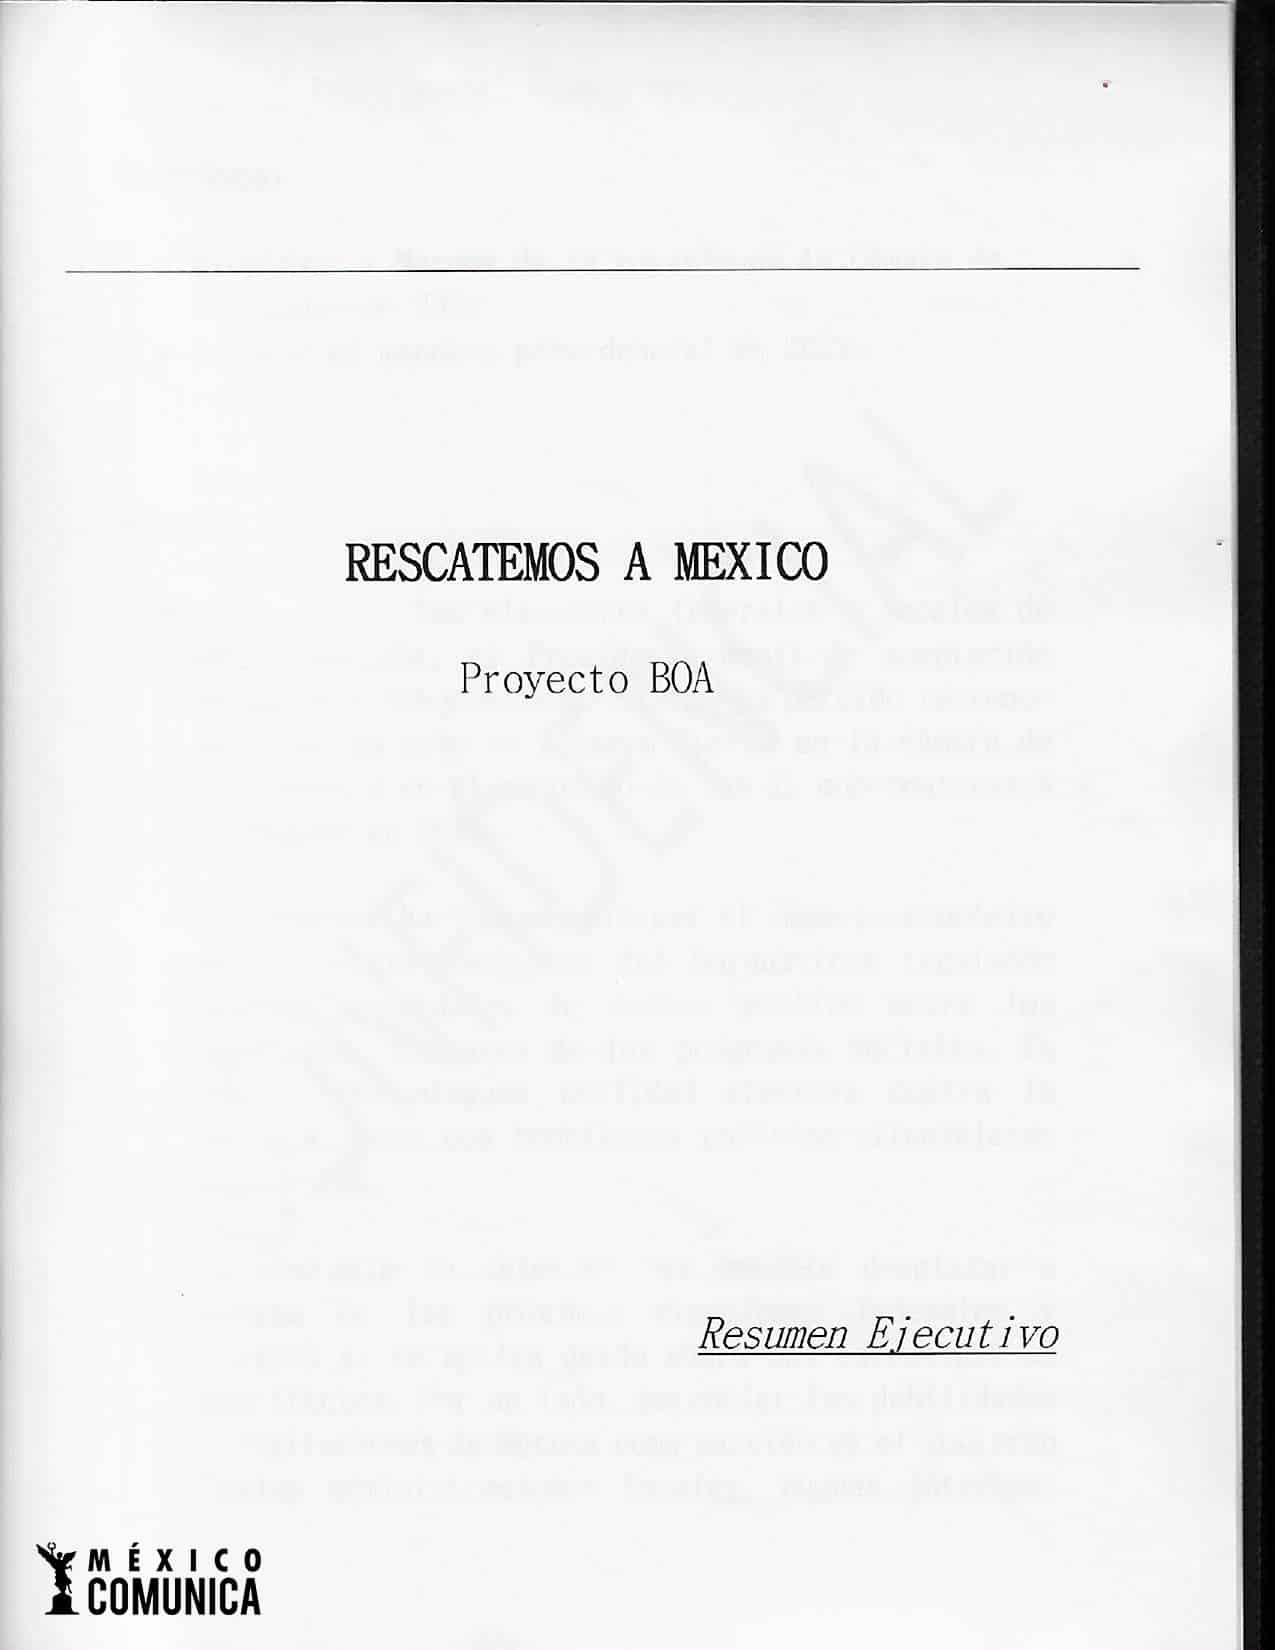 DocumentoRescatemosaMexico1